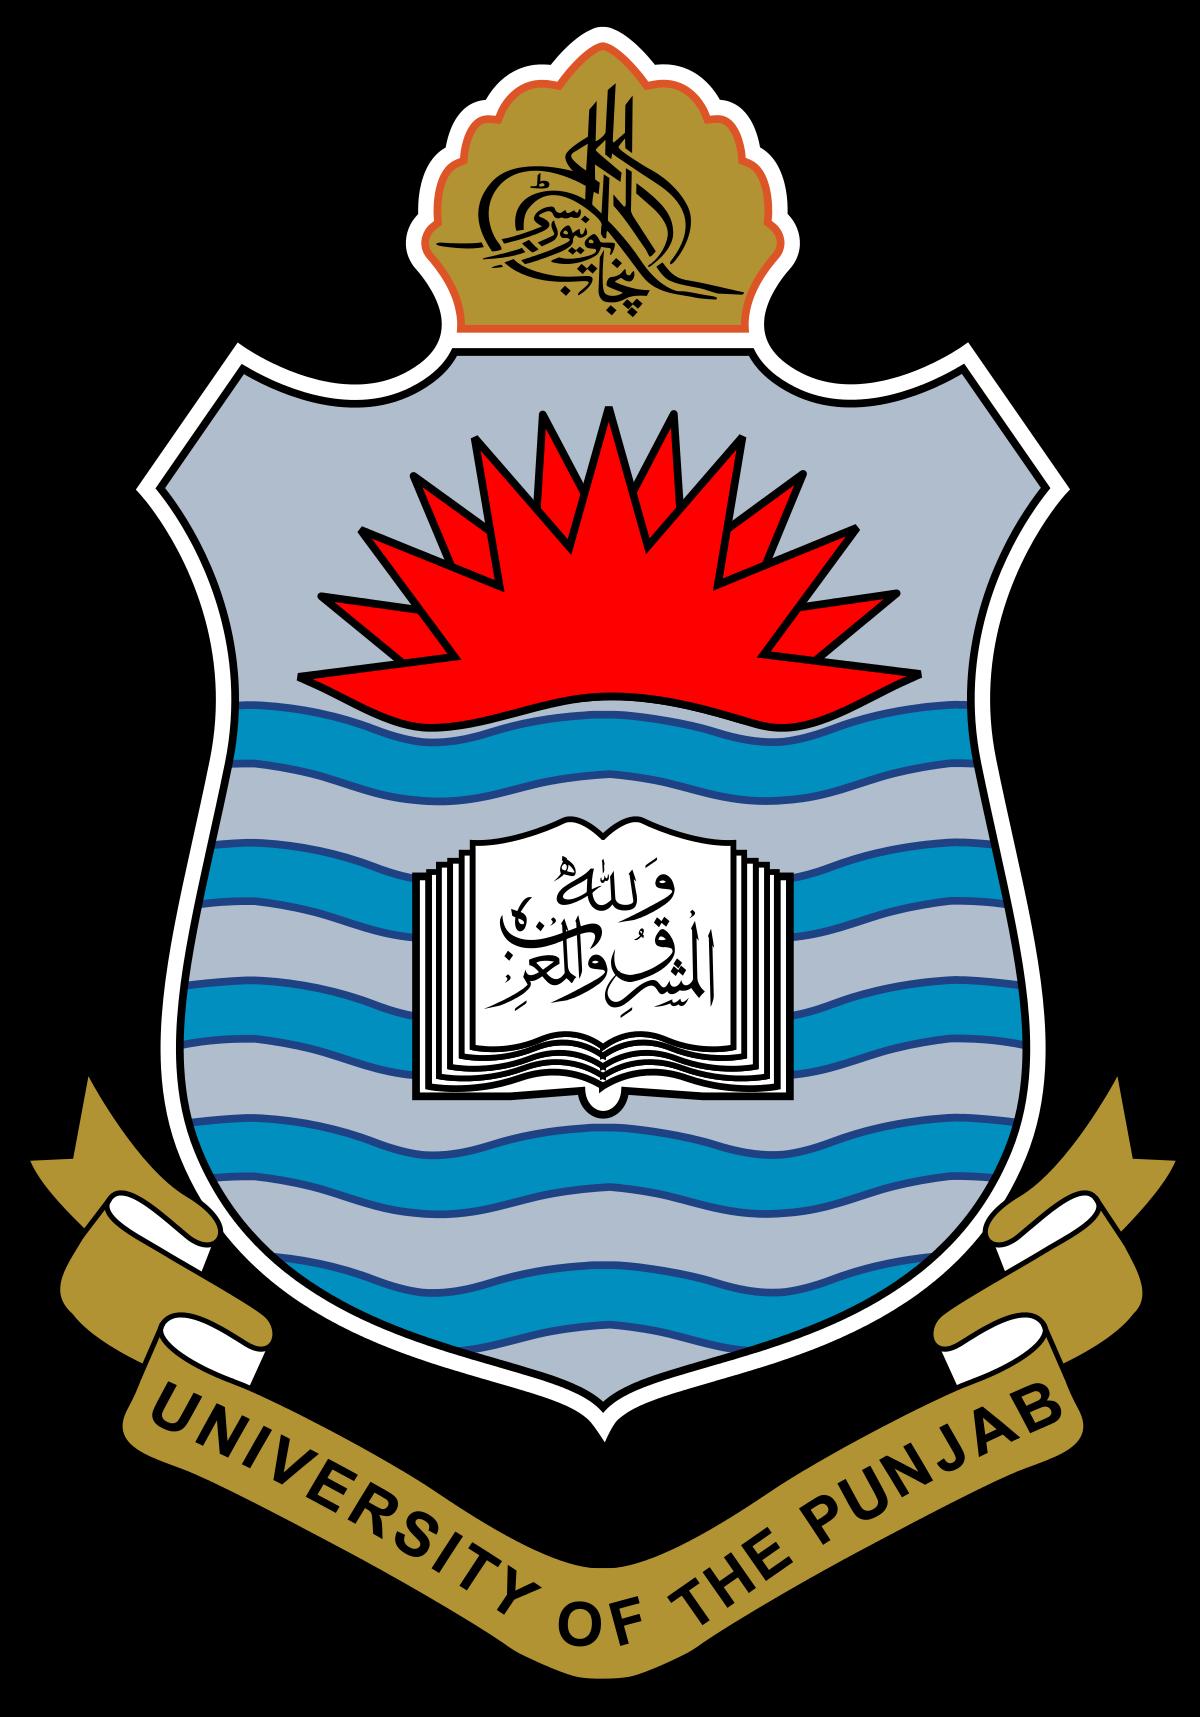 BA, BSC Punjab University Roll Number Slip 2019